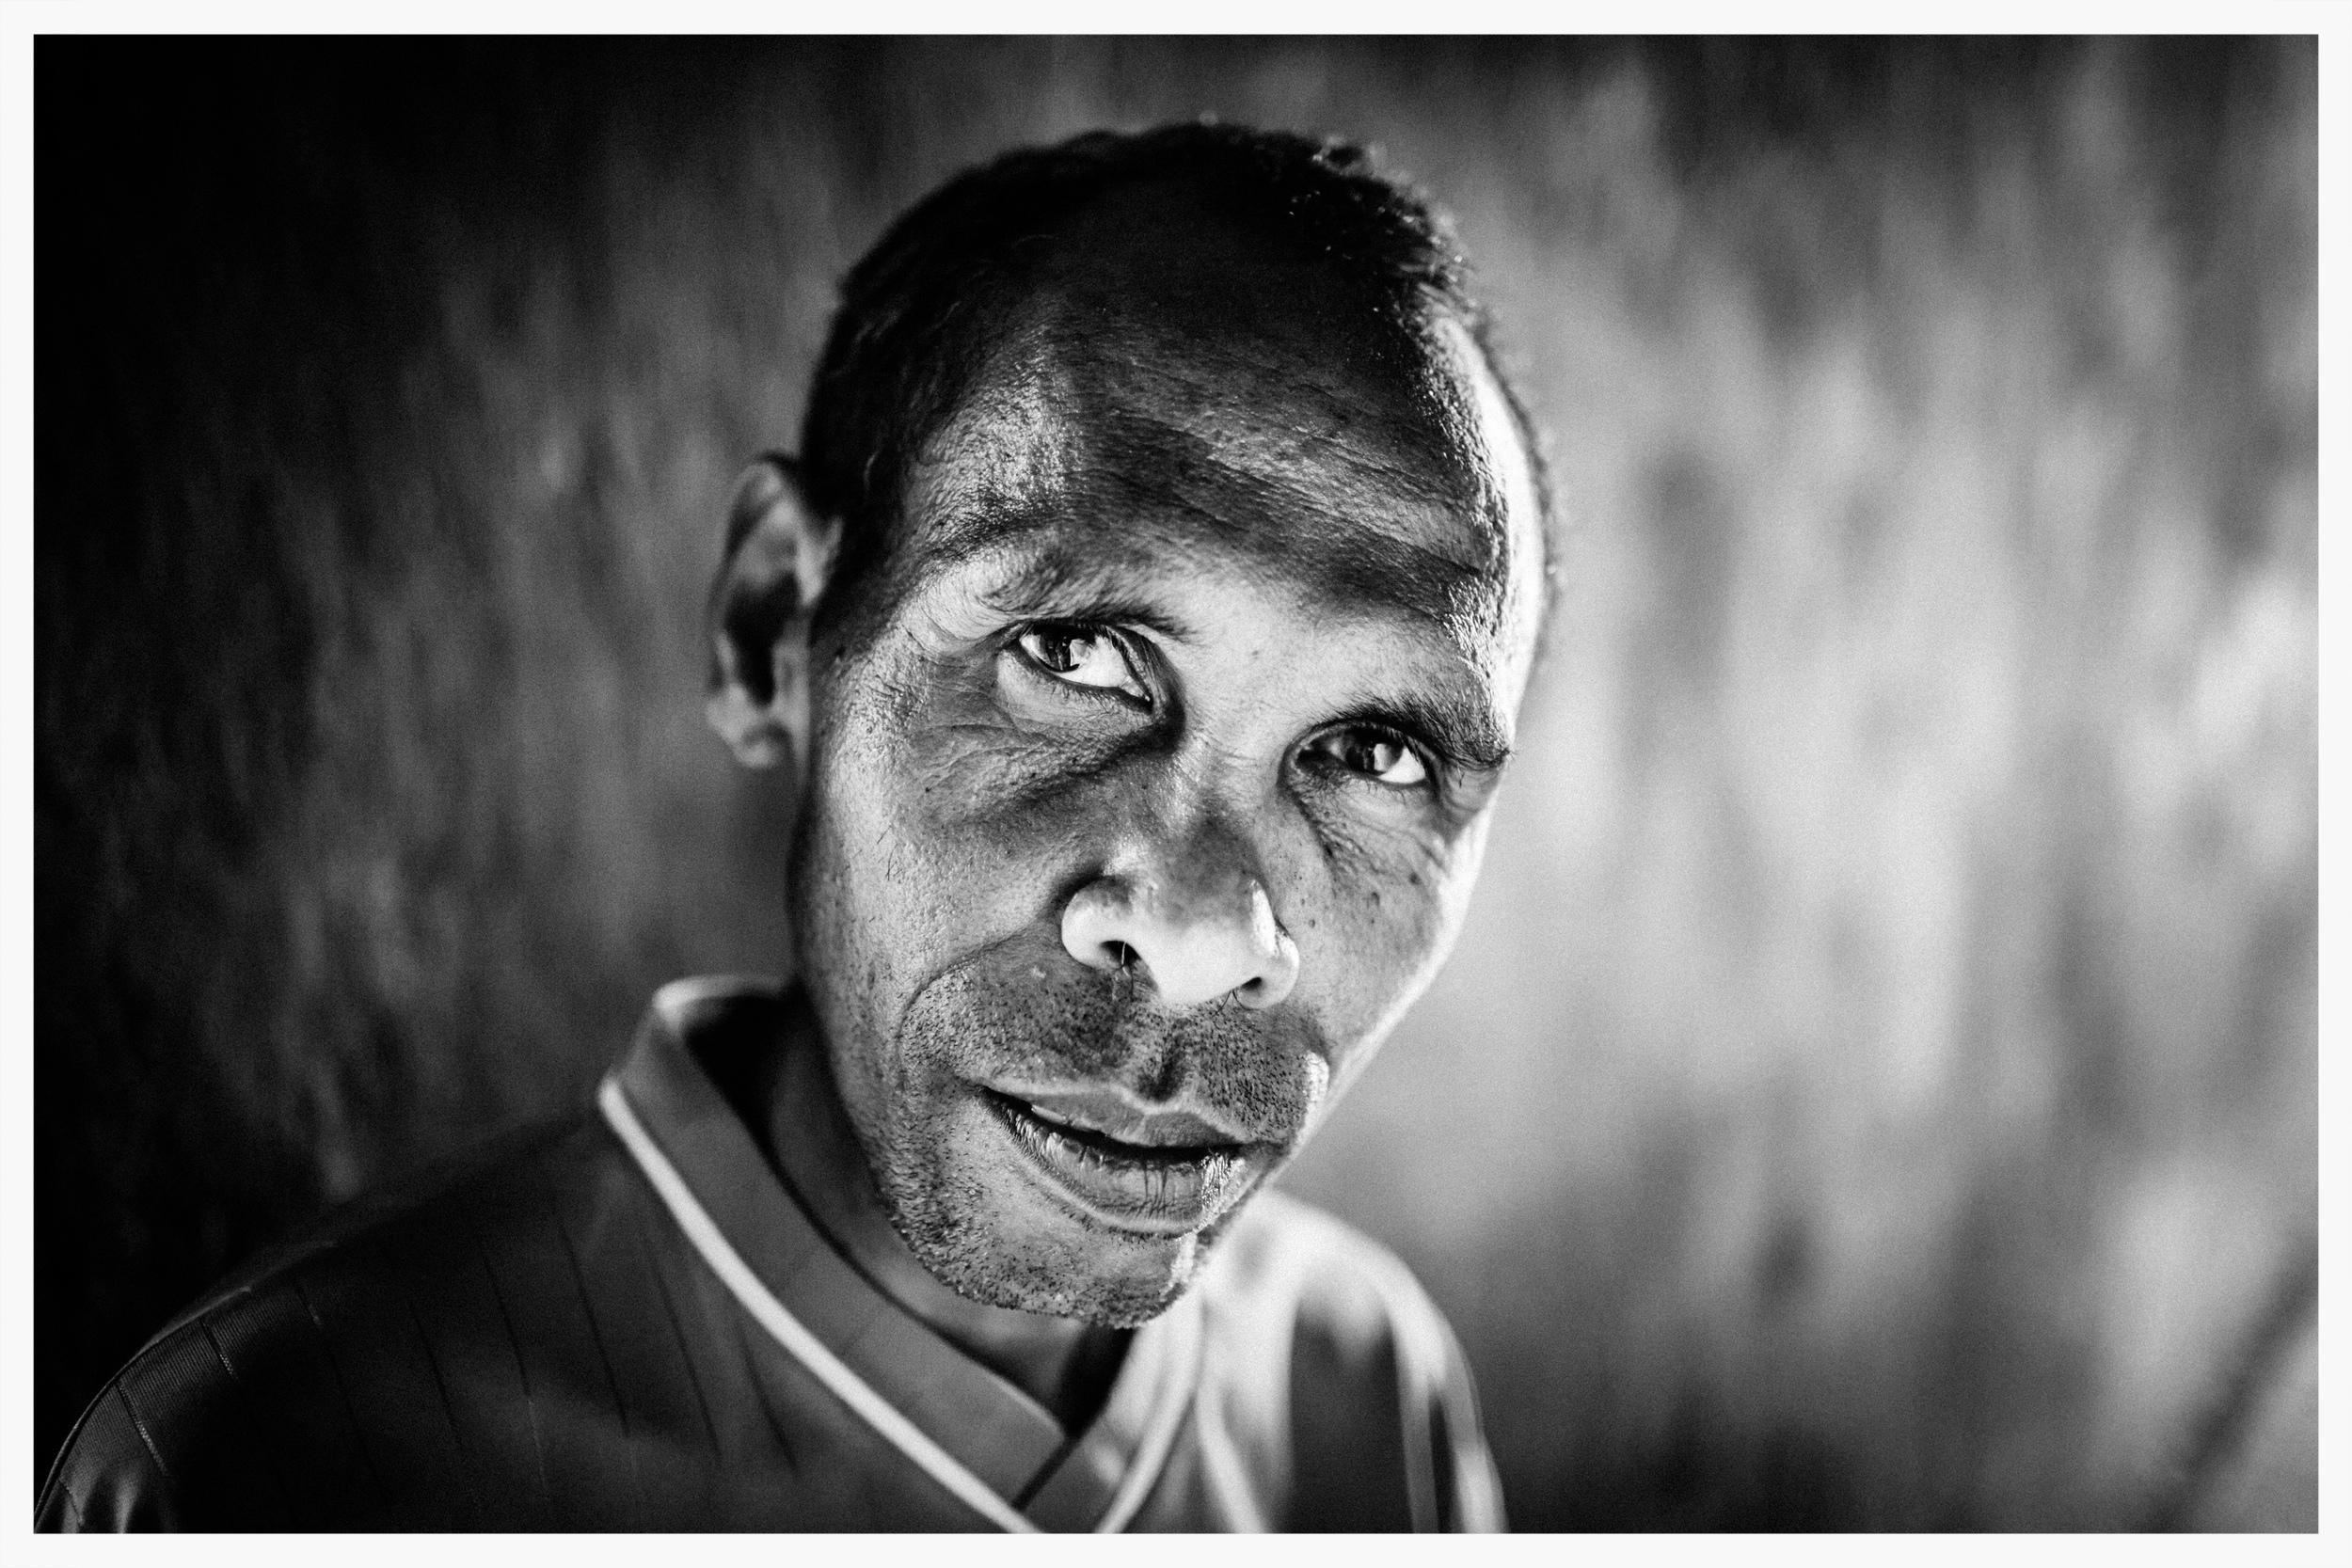 José Menezes Nunes Serrão survived an attempted beheading in April 1999.East Timor.Photo: © Marcus Perkins